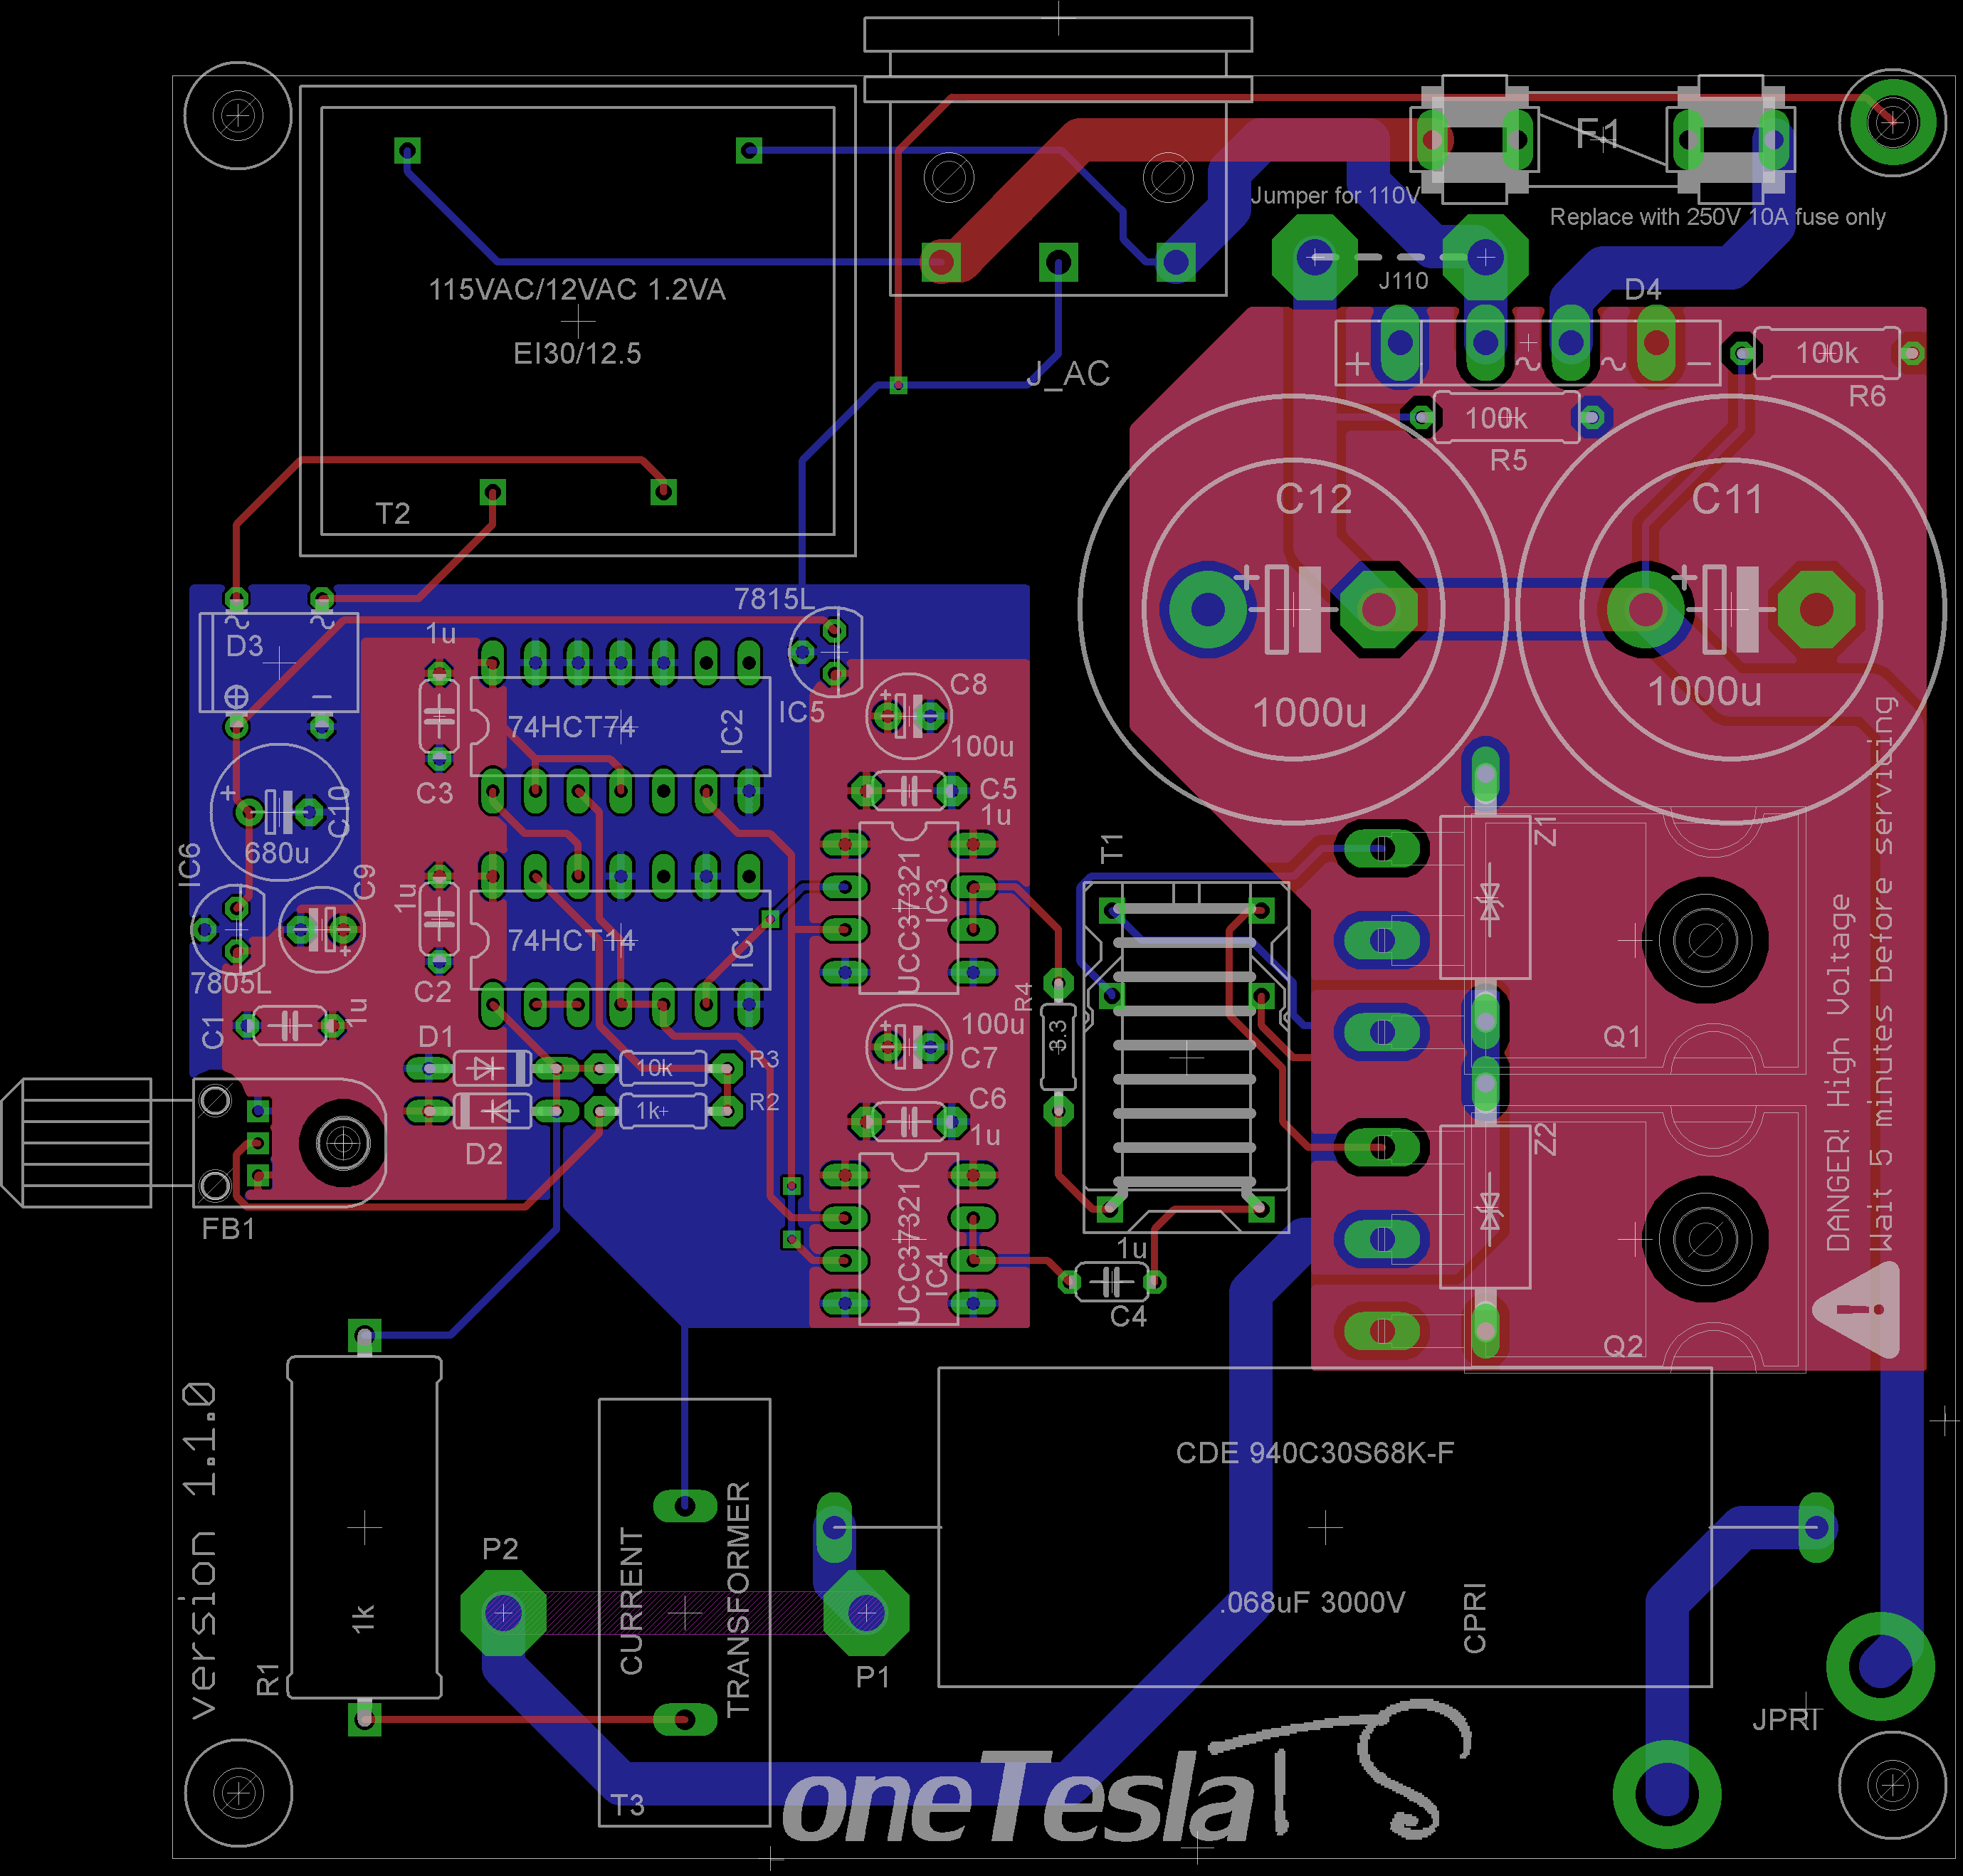 Downloads Usb Wiring Diagram Circuit Board Schematics Mini Oneteslats Schematic Ts Layout